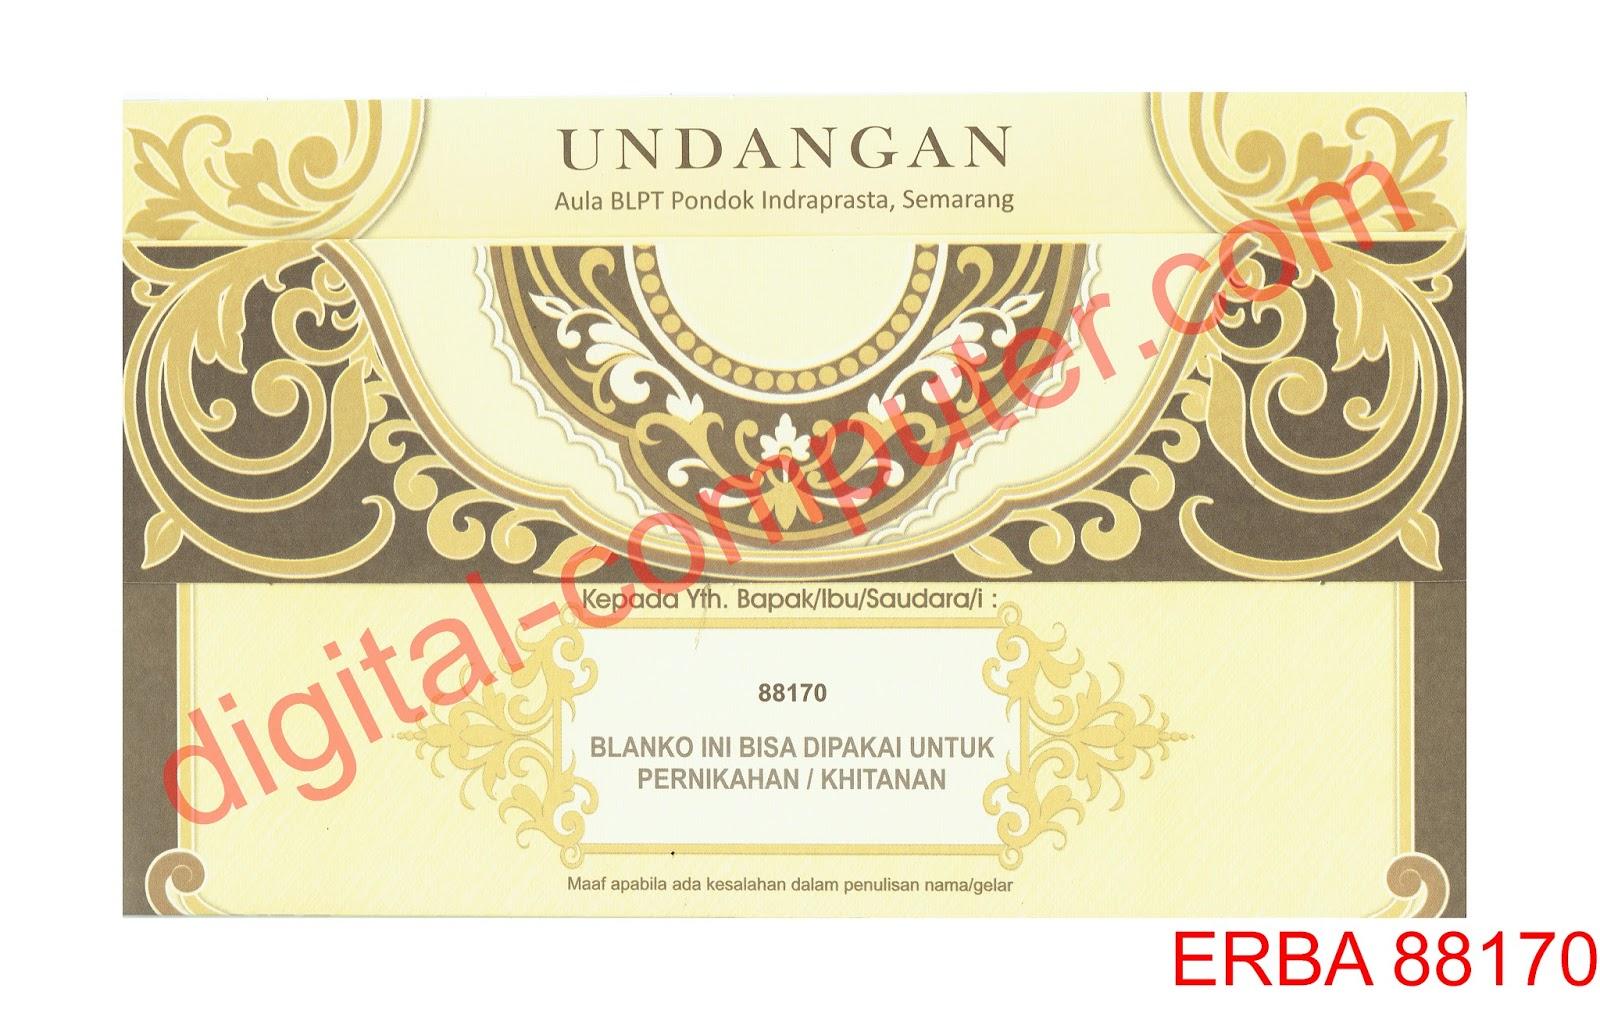 kartu undangan pernikahan, Undangan Pernikahan Softcover, undangan pernikahan harga 1000an rupiah